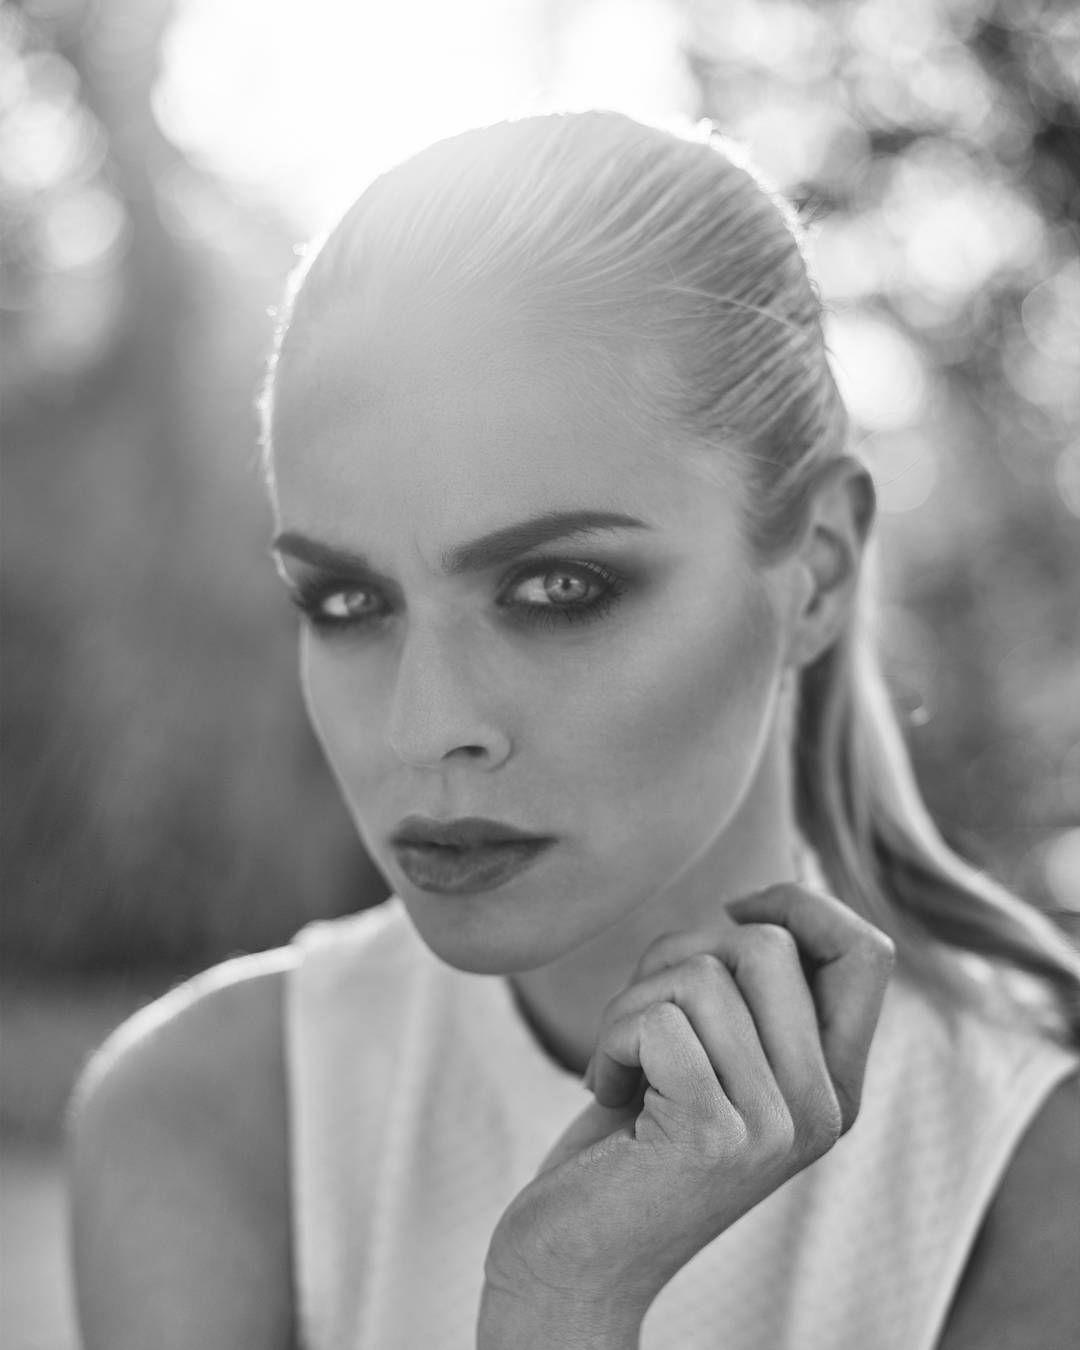 Have a nice weekend folks!  Model @johannathuresson  Makeup & hair @elinhang  #France #monochrome #portrait #vsco #bw #Fashion #fashionphotography #style #look #beauty #makeup #model #riviera #hair #photoshoot by johanstjerneus